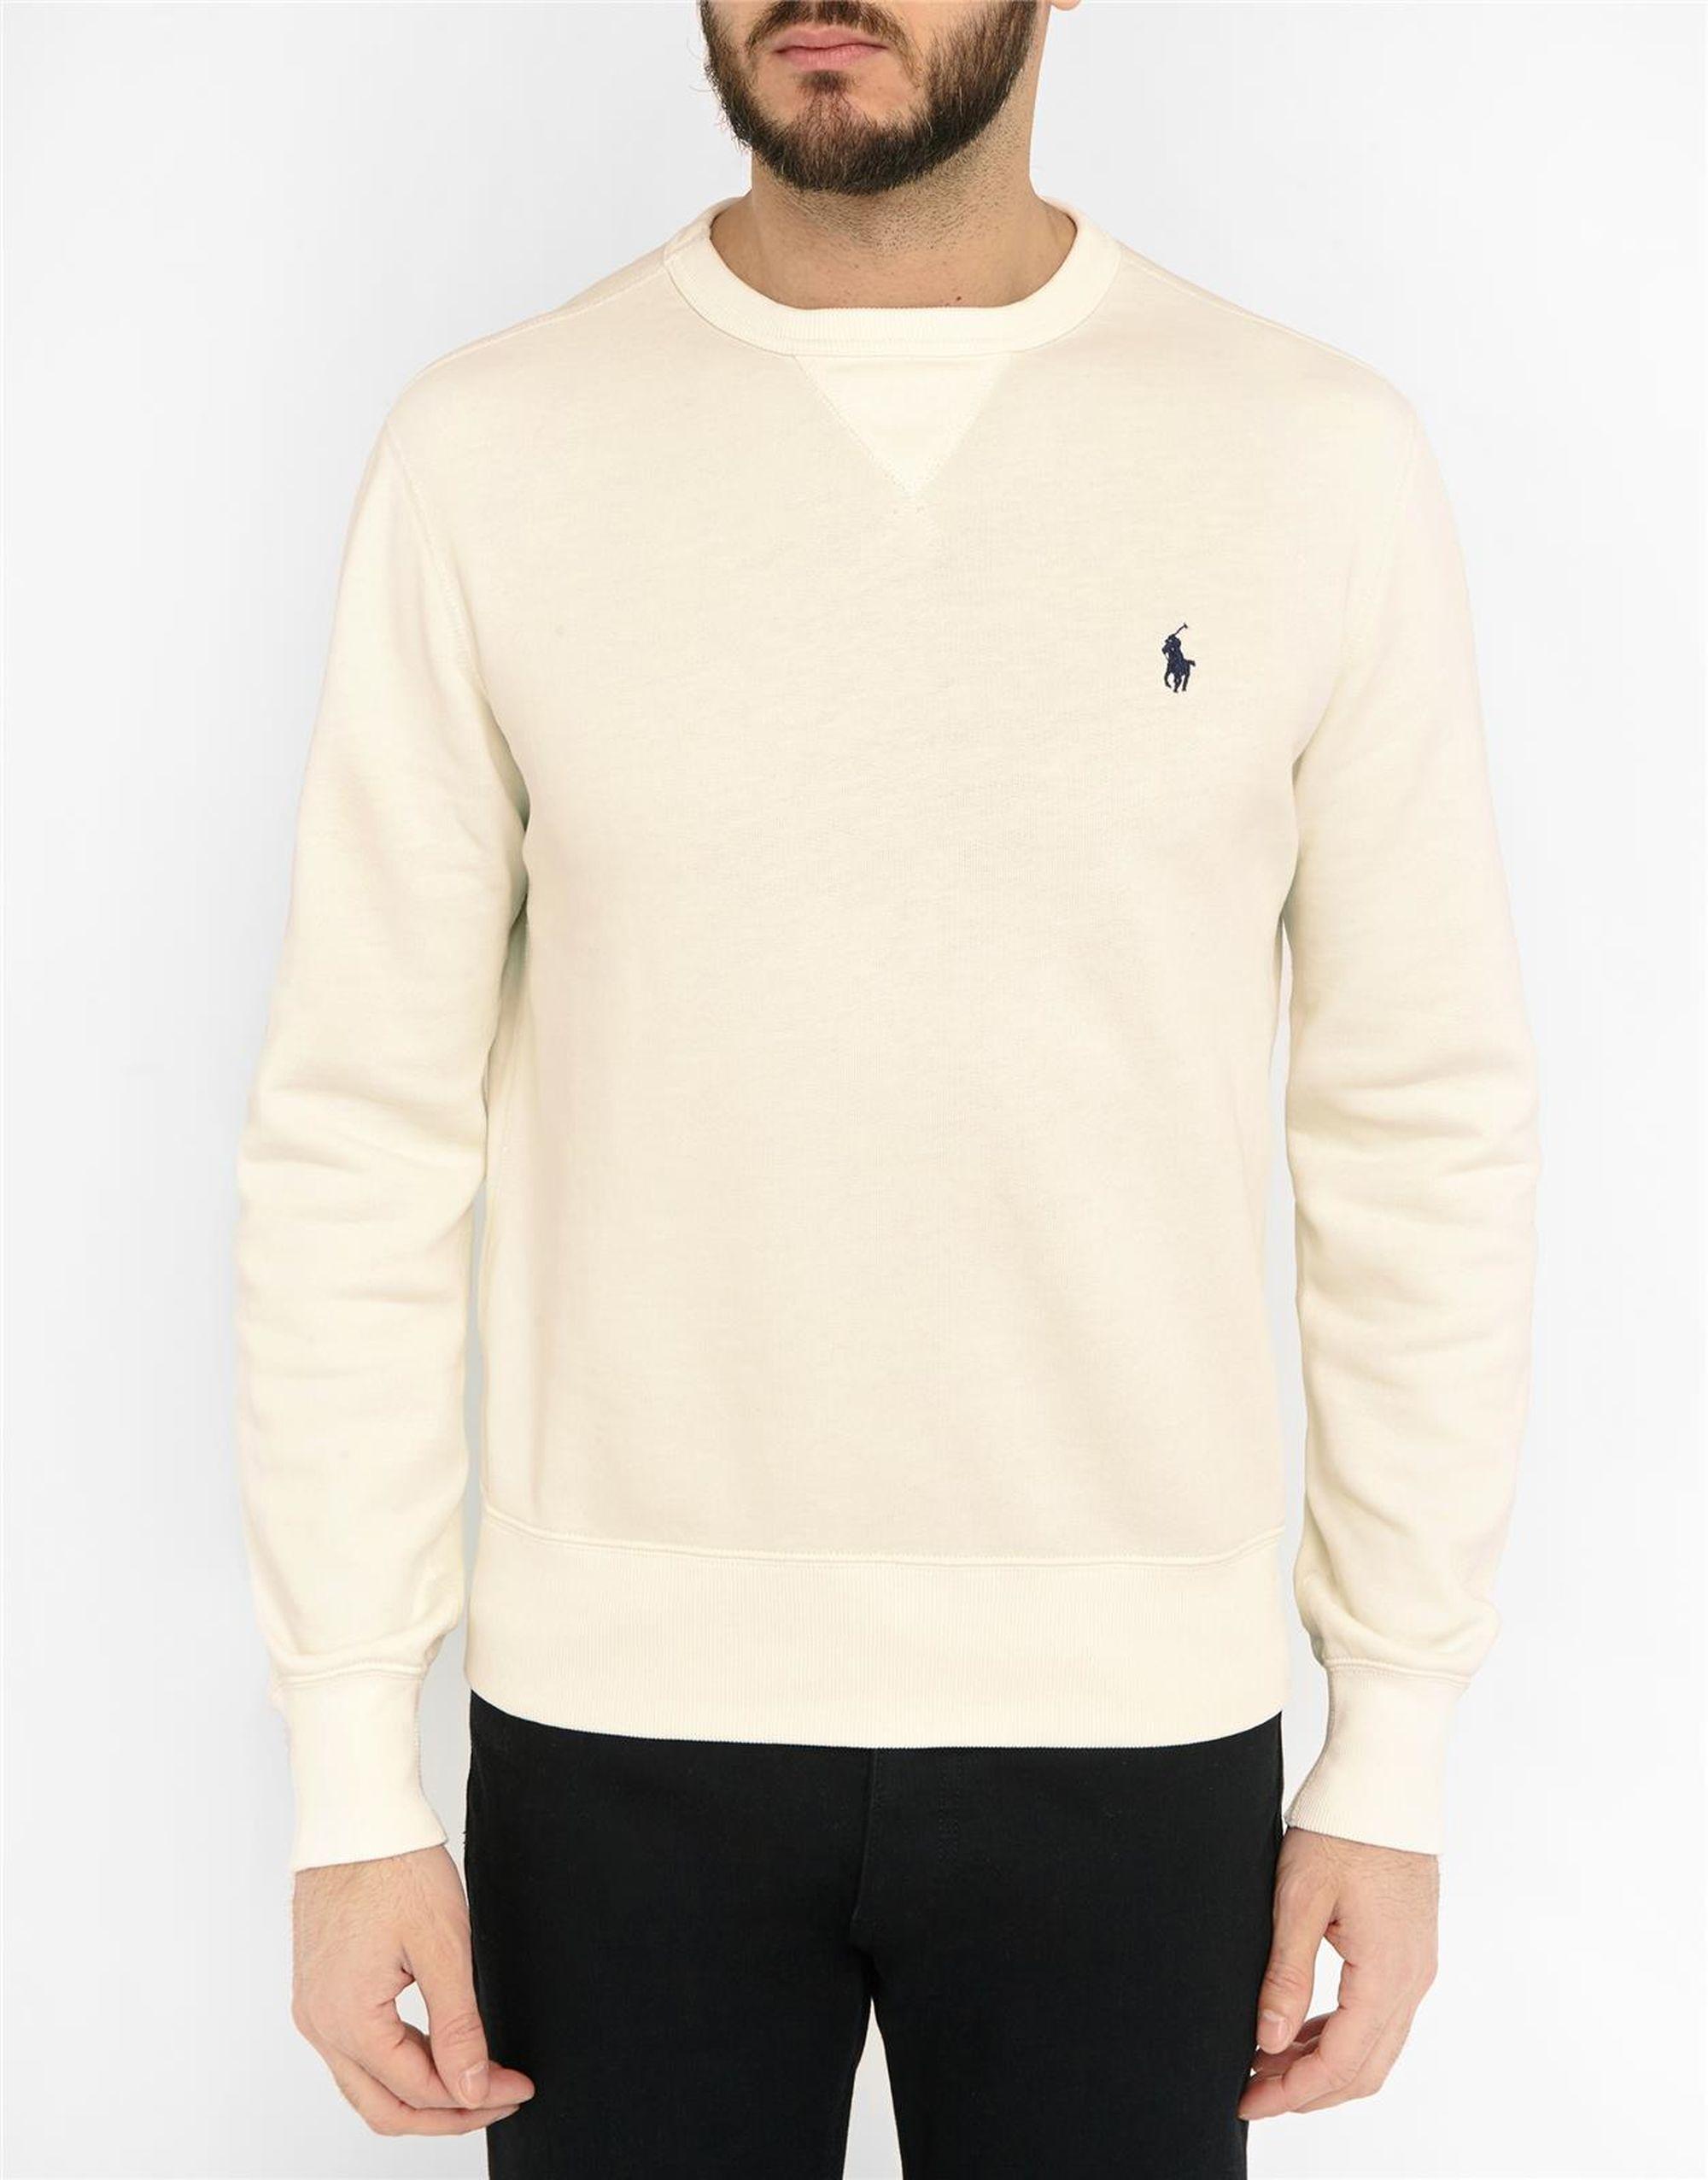 polo ralph lauren off white sweatshirt in white for men lyst. Black Bedroom Furniture Sets. Home Design Ideas